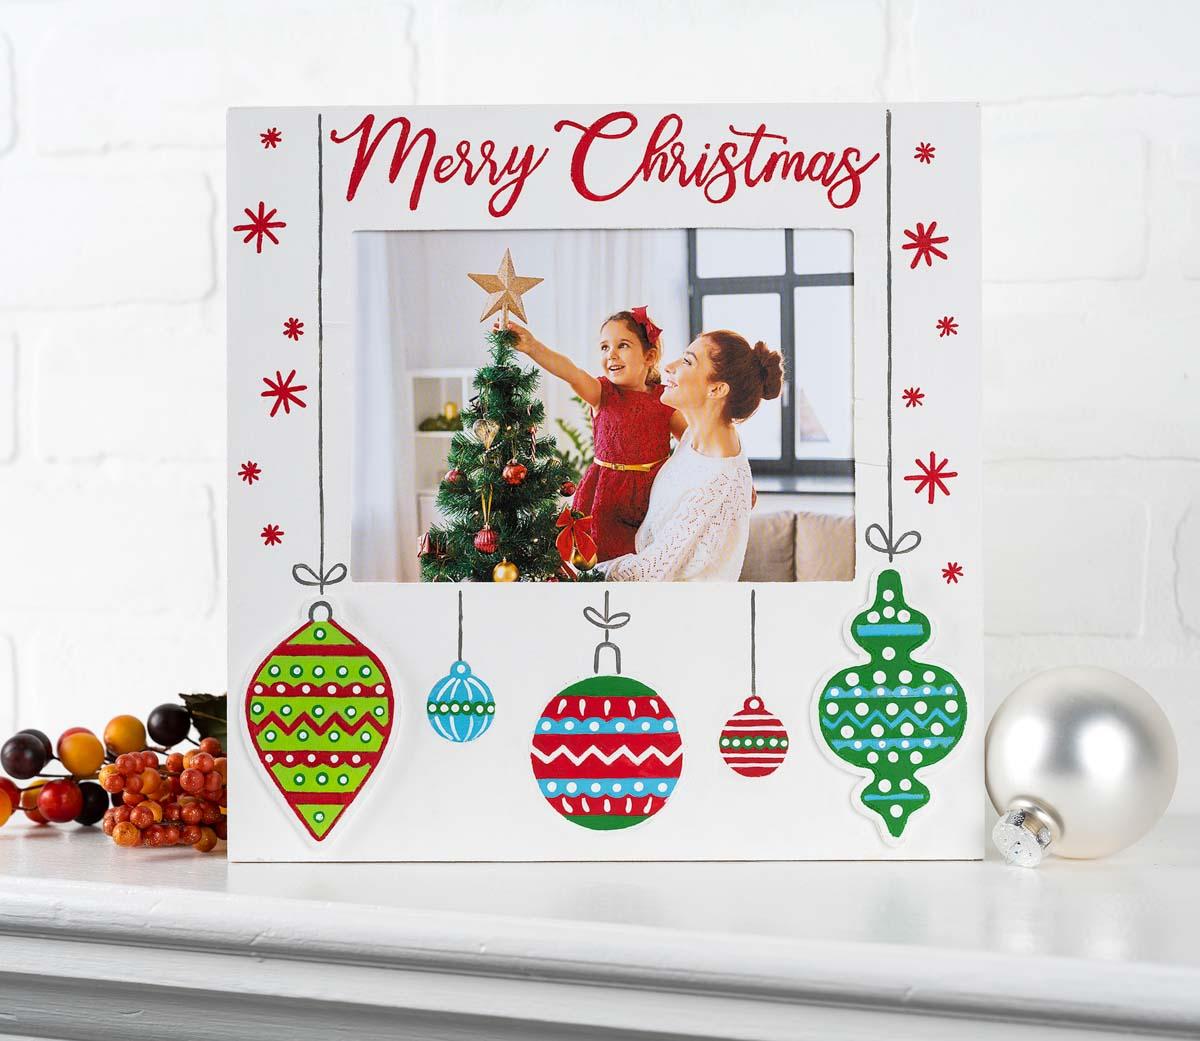 Plaid ® Wood Surfaces - Christmas Celebration Frame and Plaque - 56980